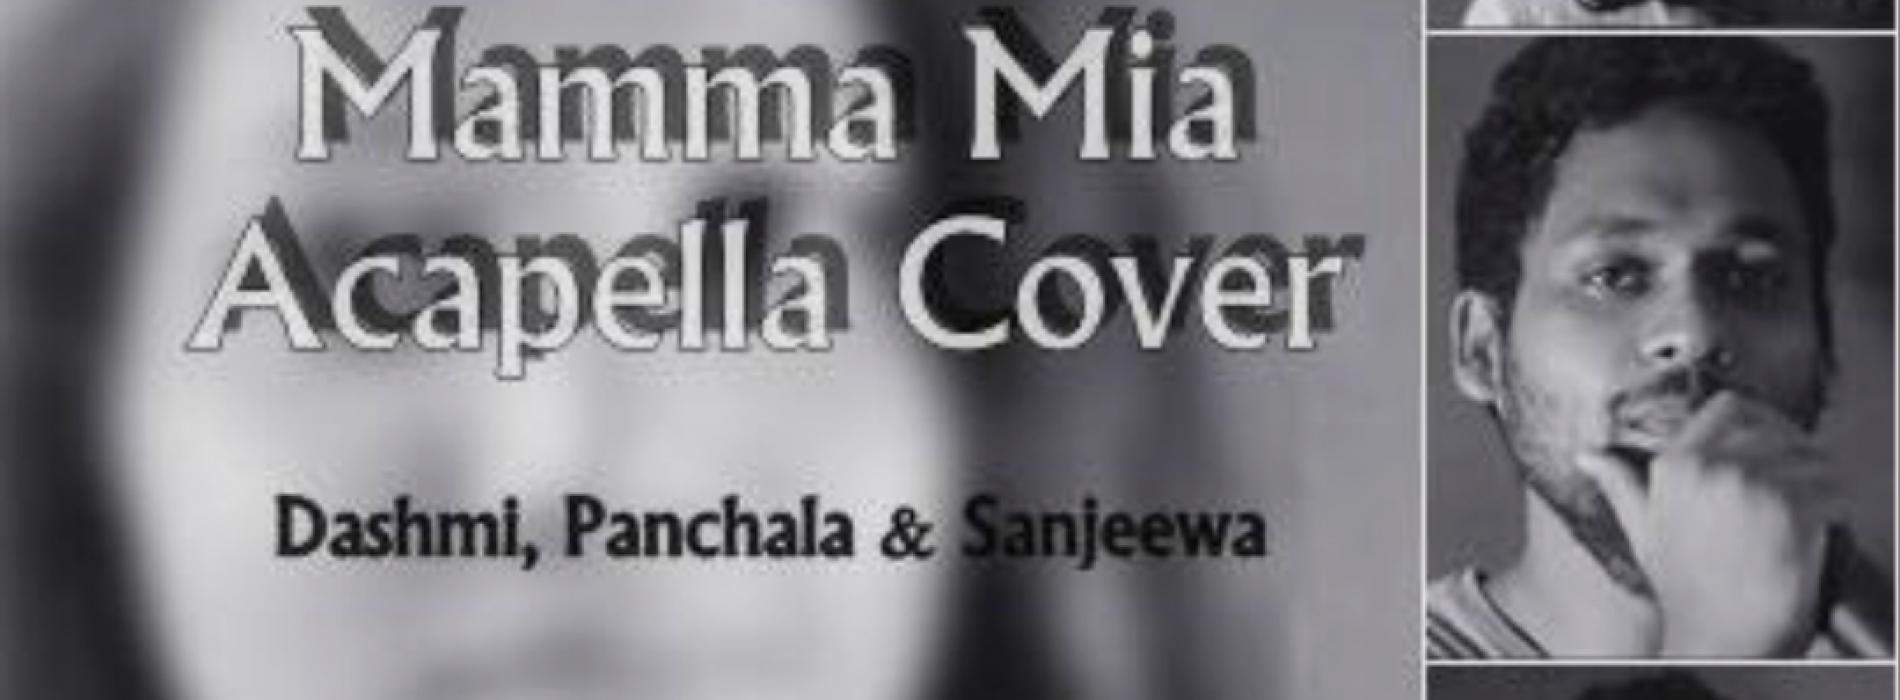 Dashmi, Panchala and Sanjeewa – Mamma Mia Acapella version